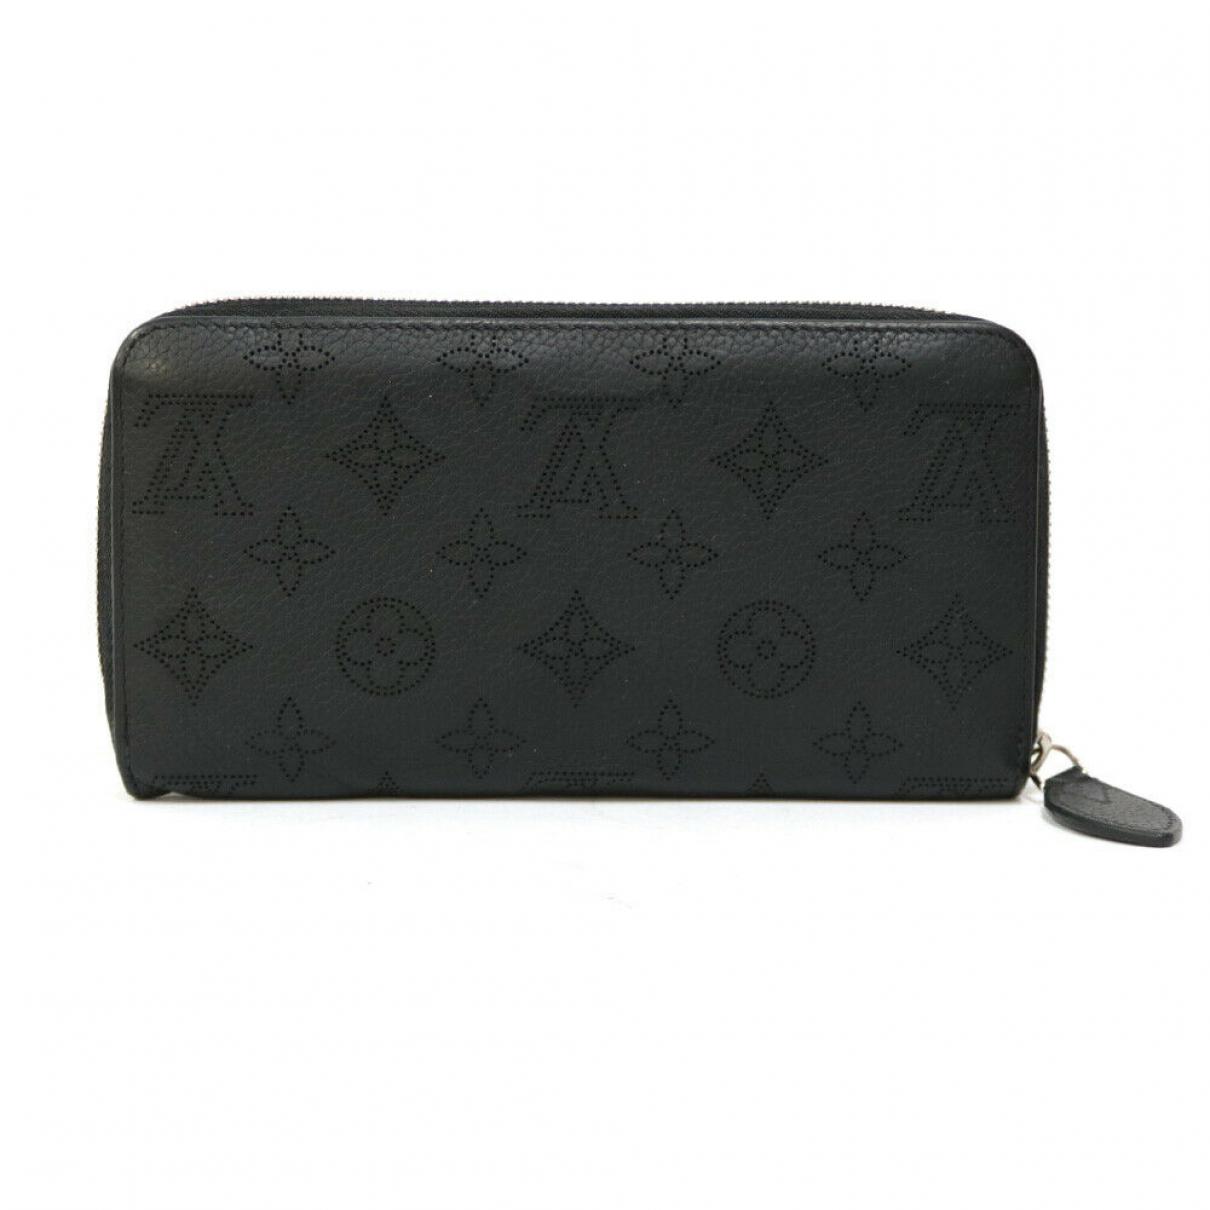 Louis Vuitton \N Kleinlederwaren Schwarz